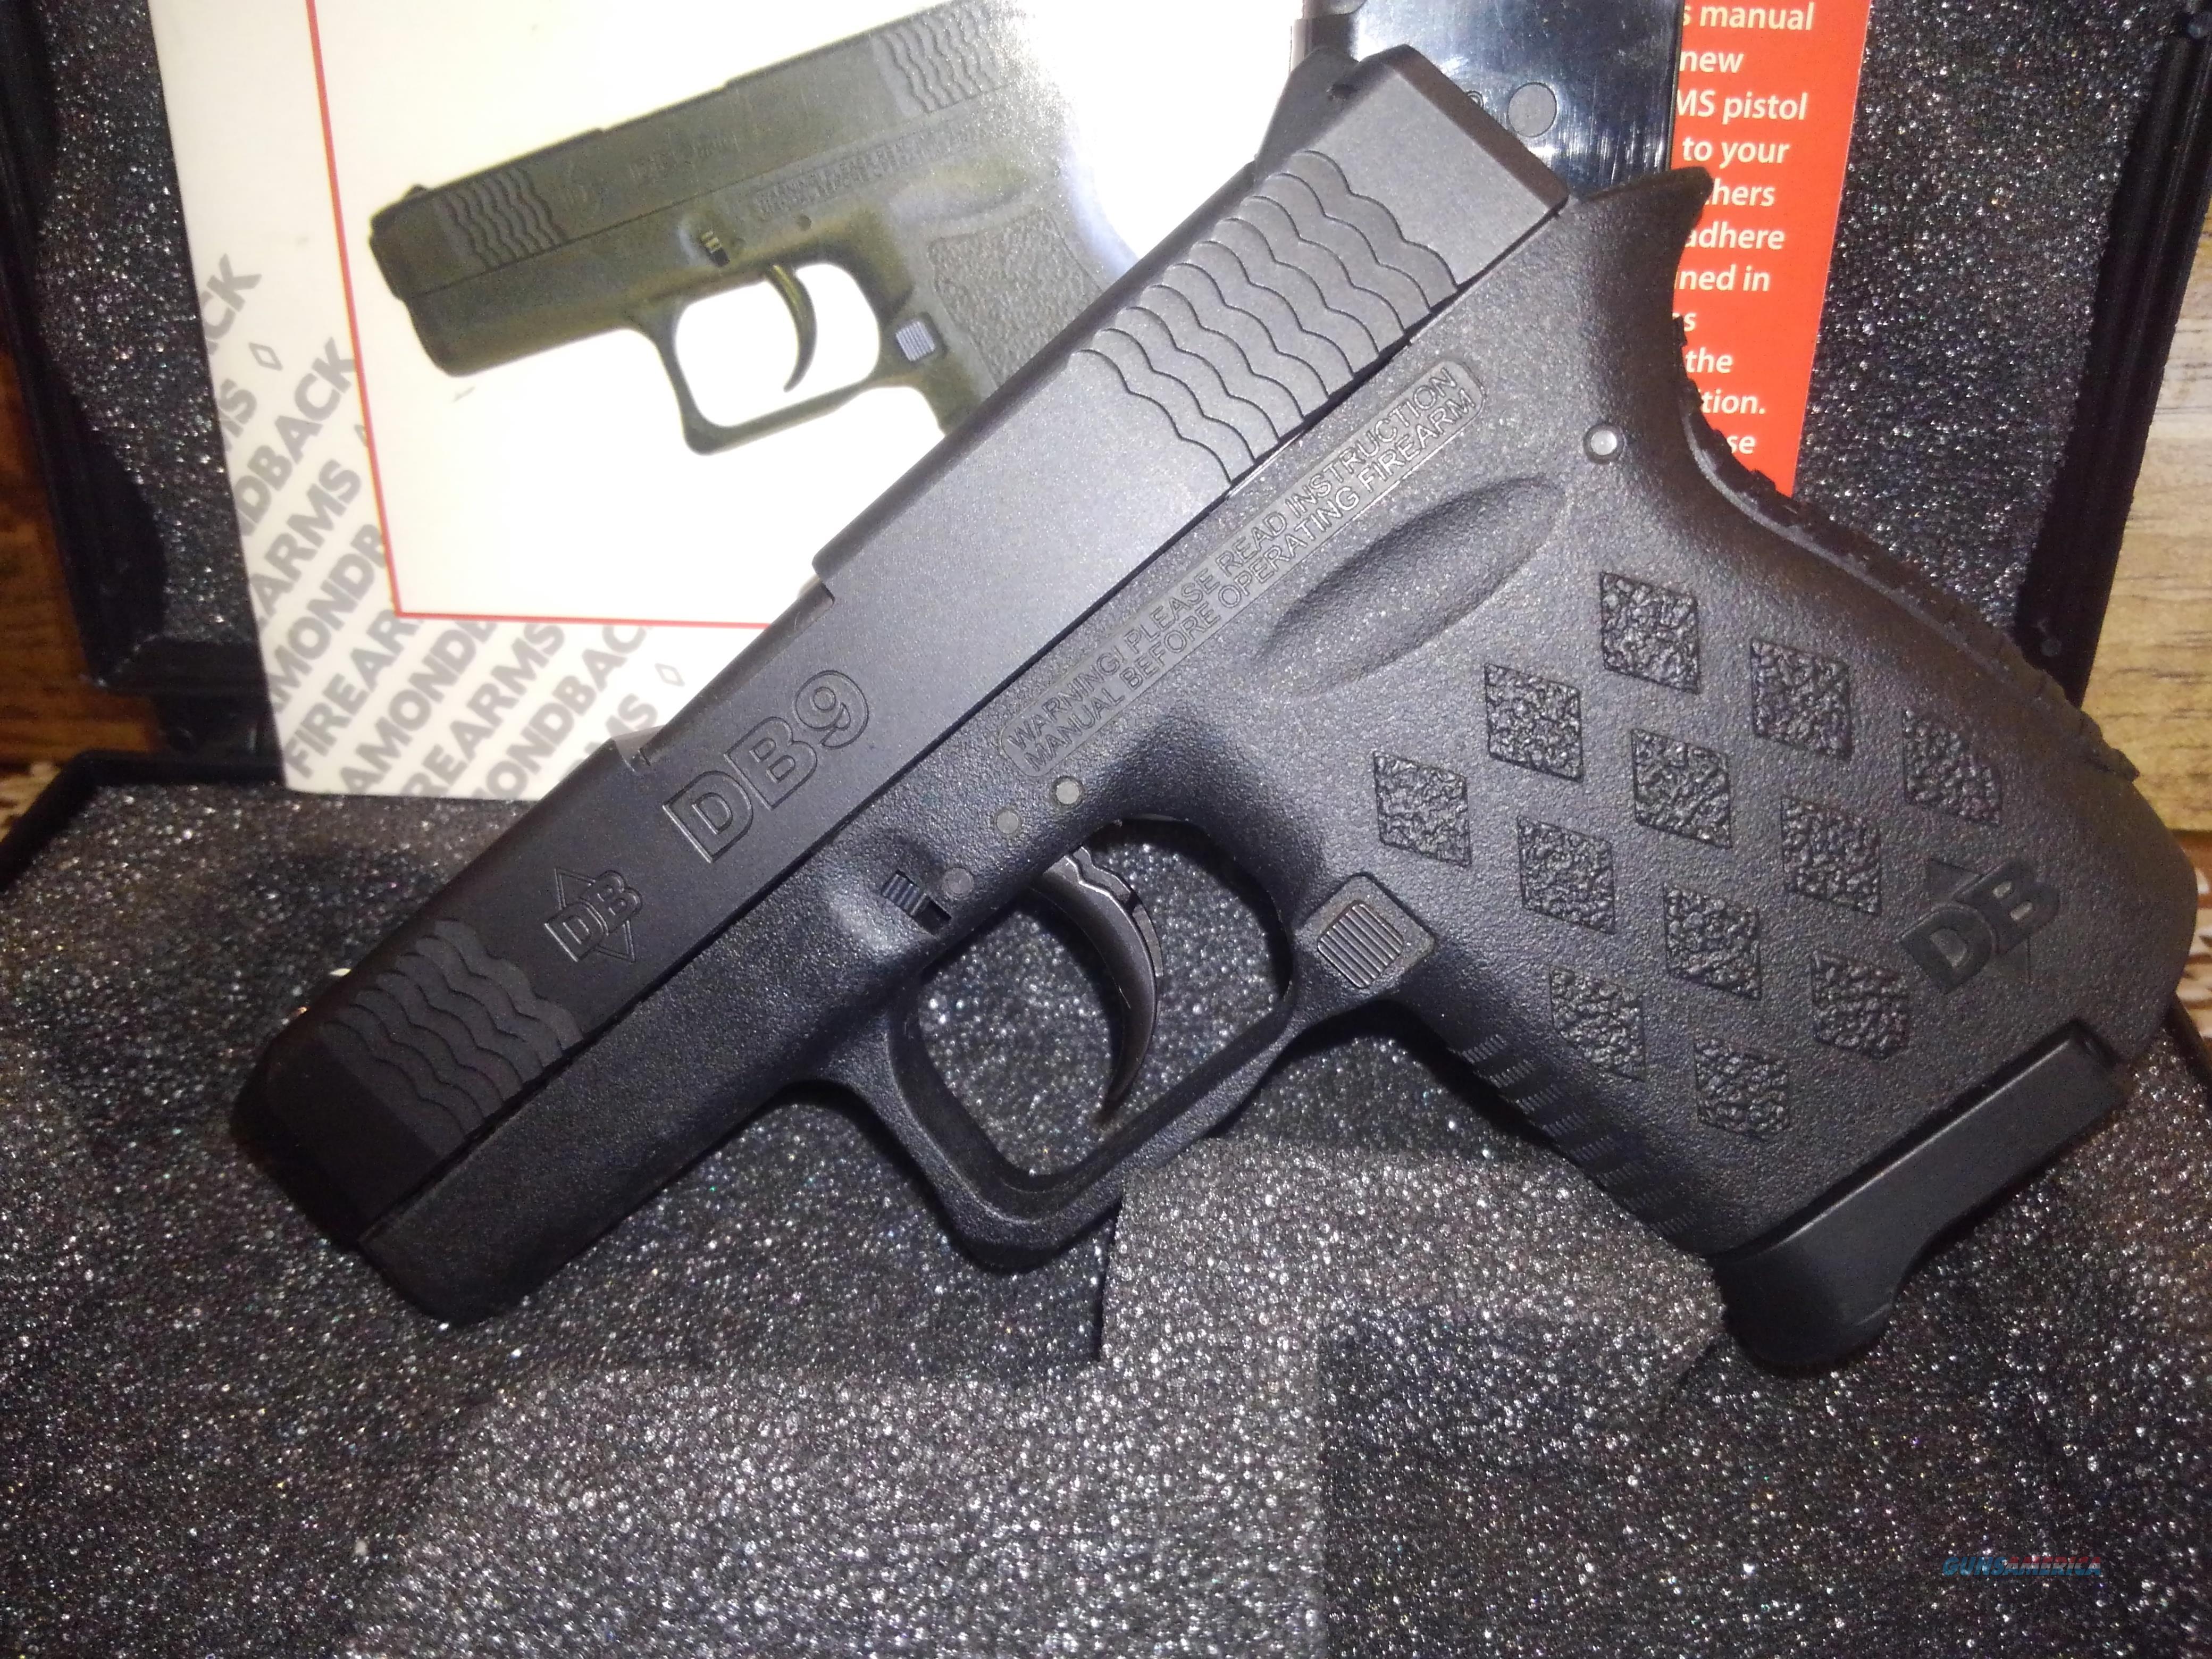 DIAMONDBACK DB9 9MM  2-6RD MAGS, FREE SHIPPING NO CC FEE  Guns > Pistols > Diamondback Pistols